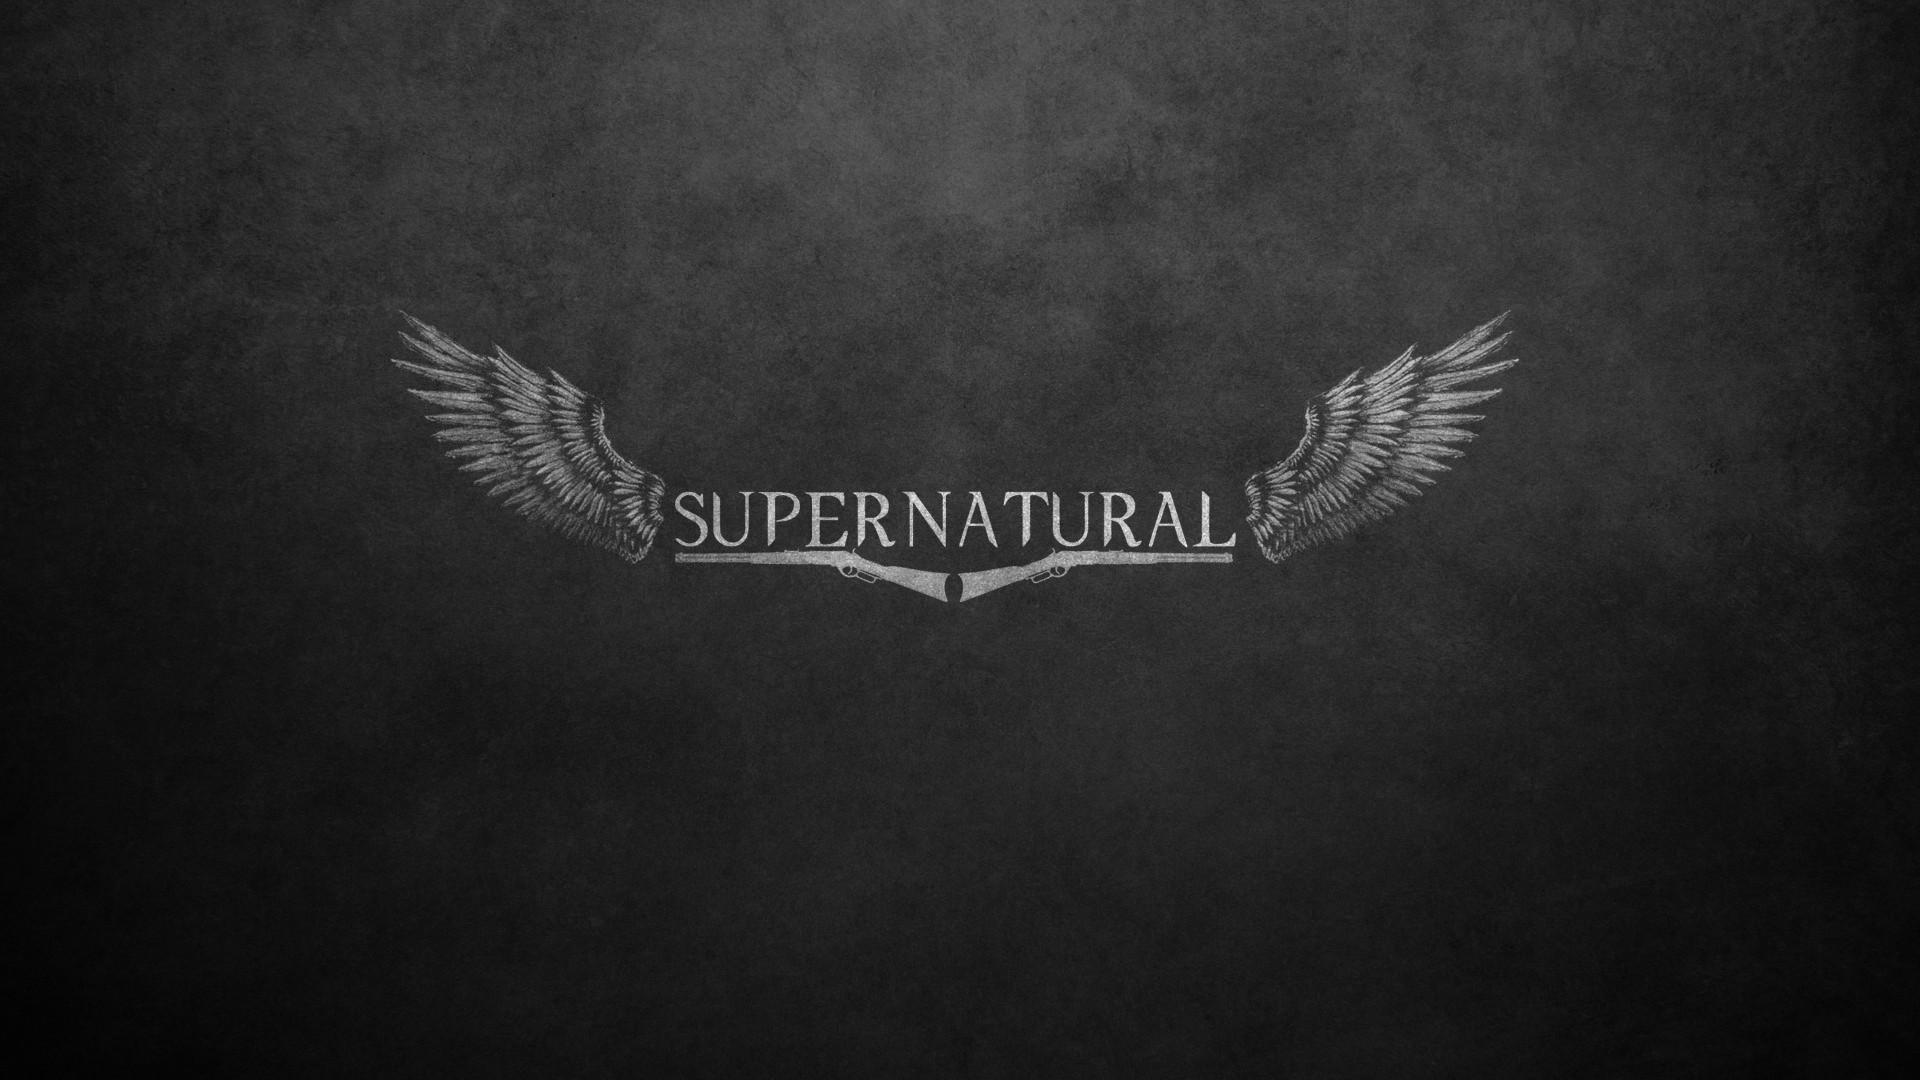 Supernatural wallpaper   1024234 1920x1080